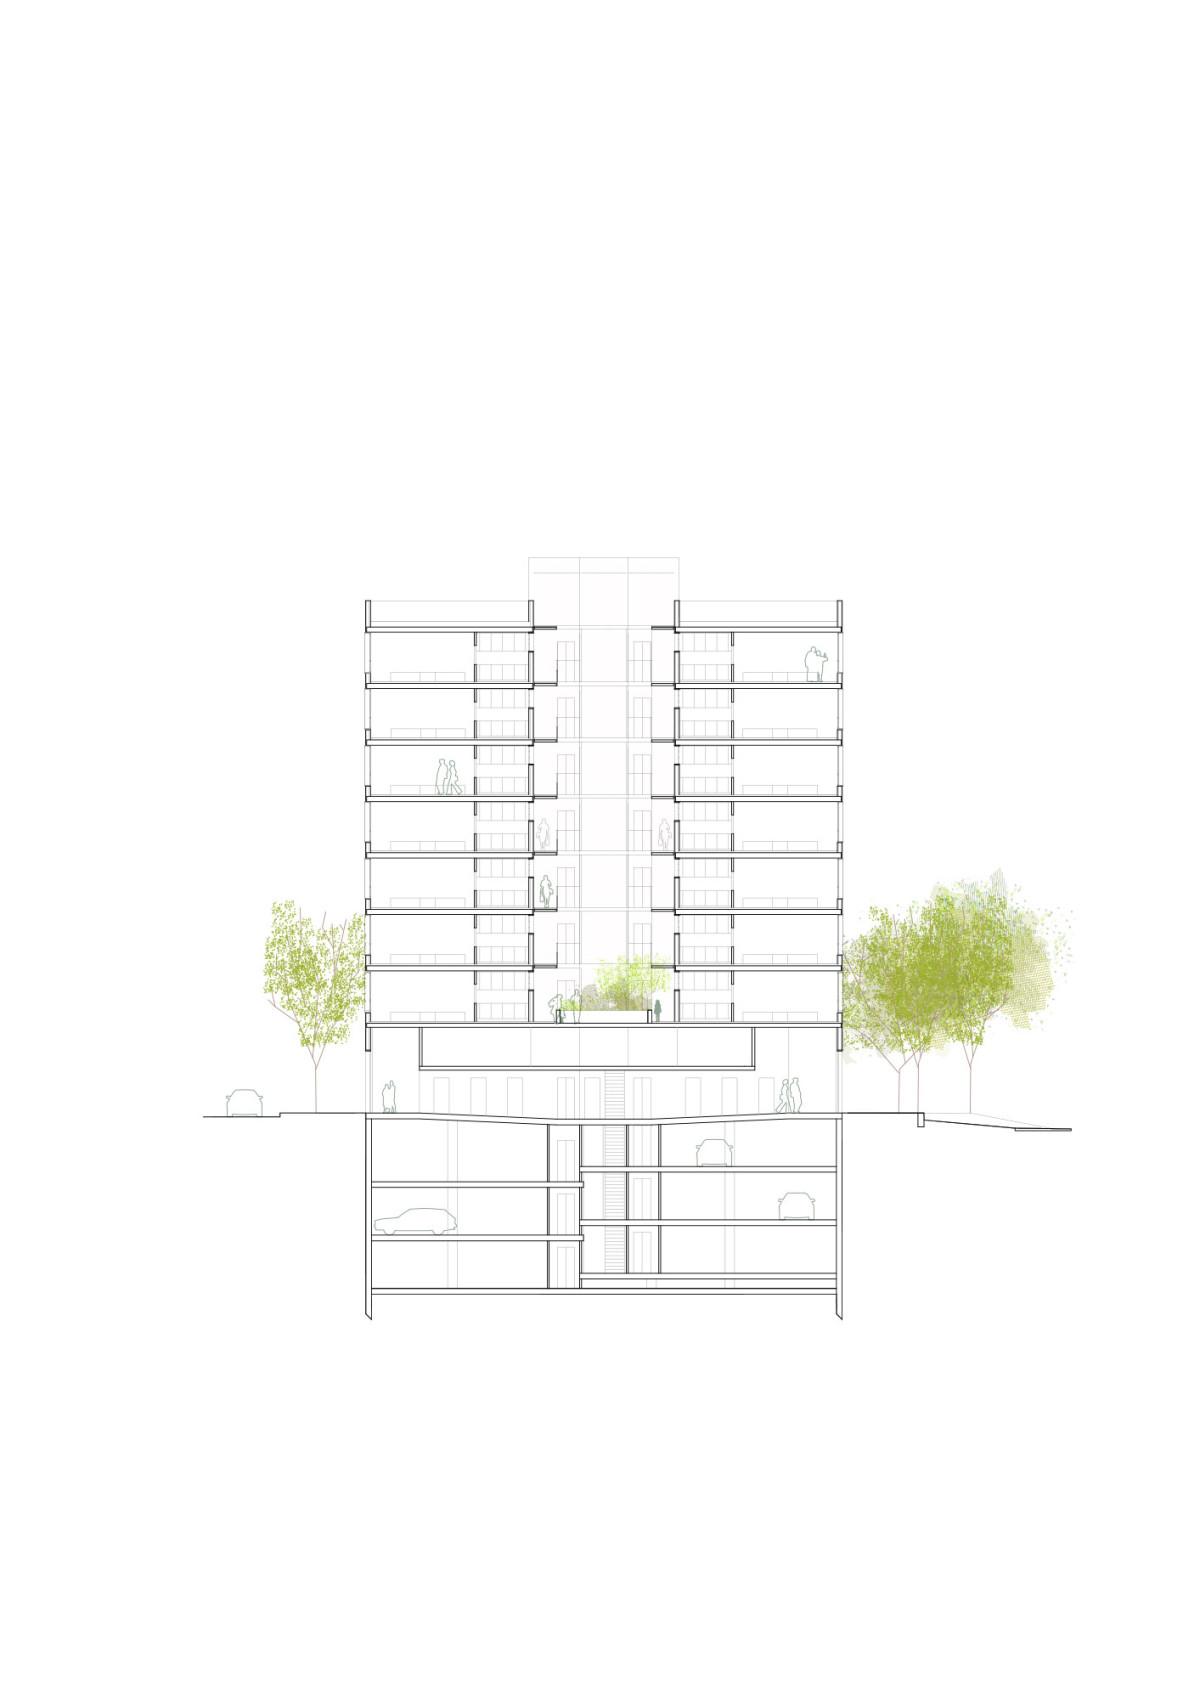 Herreros . MIM-A . Mixed Housing . Sant Boi de Llobregat afasia + (6)